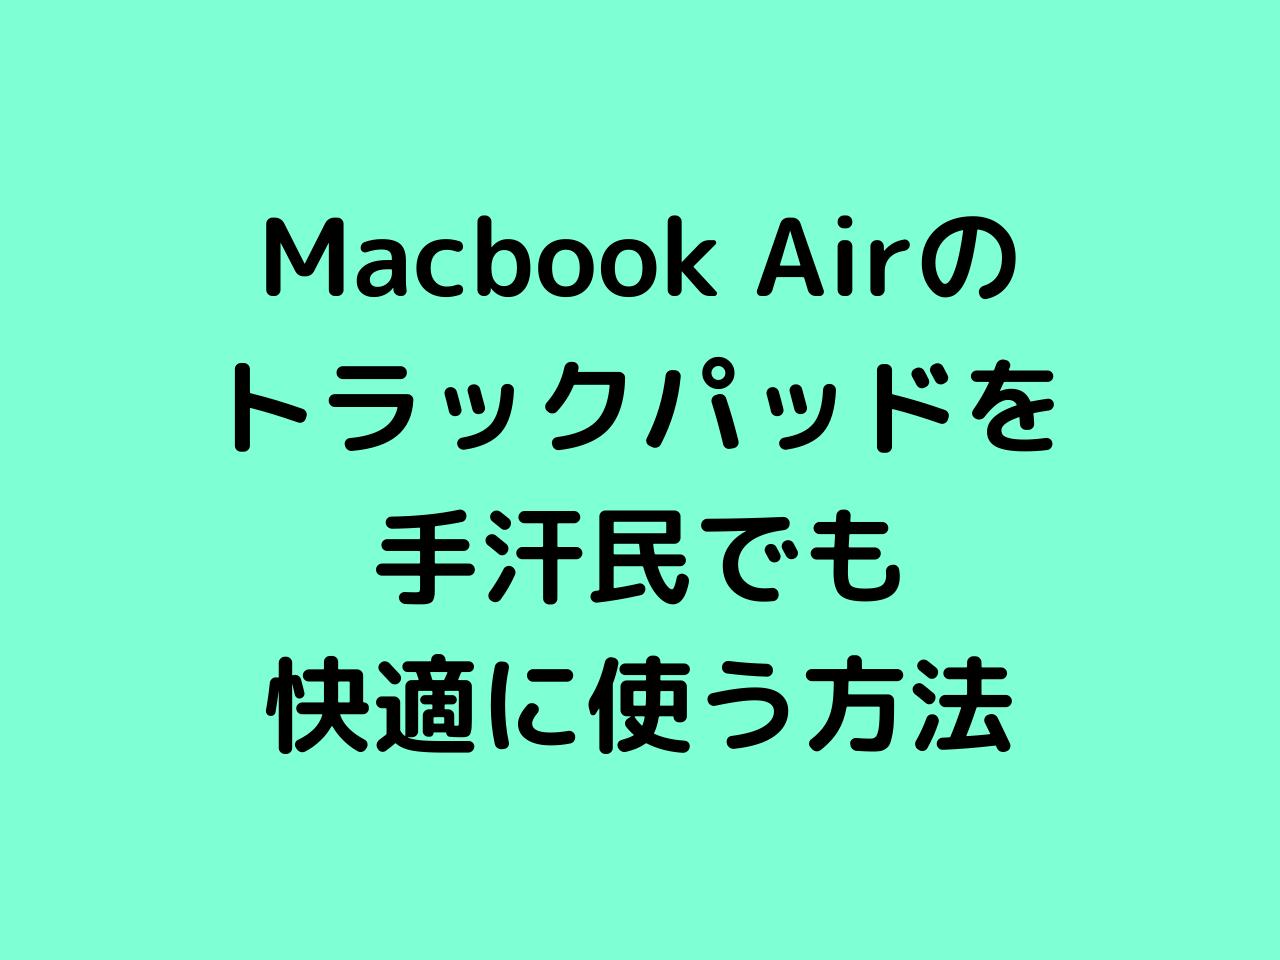 Macbook Airのトラックパッドを手汗民でも快適に使う方法